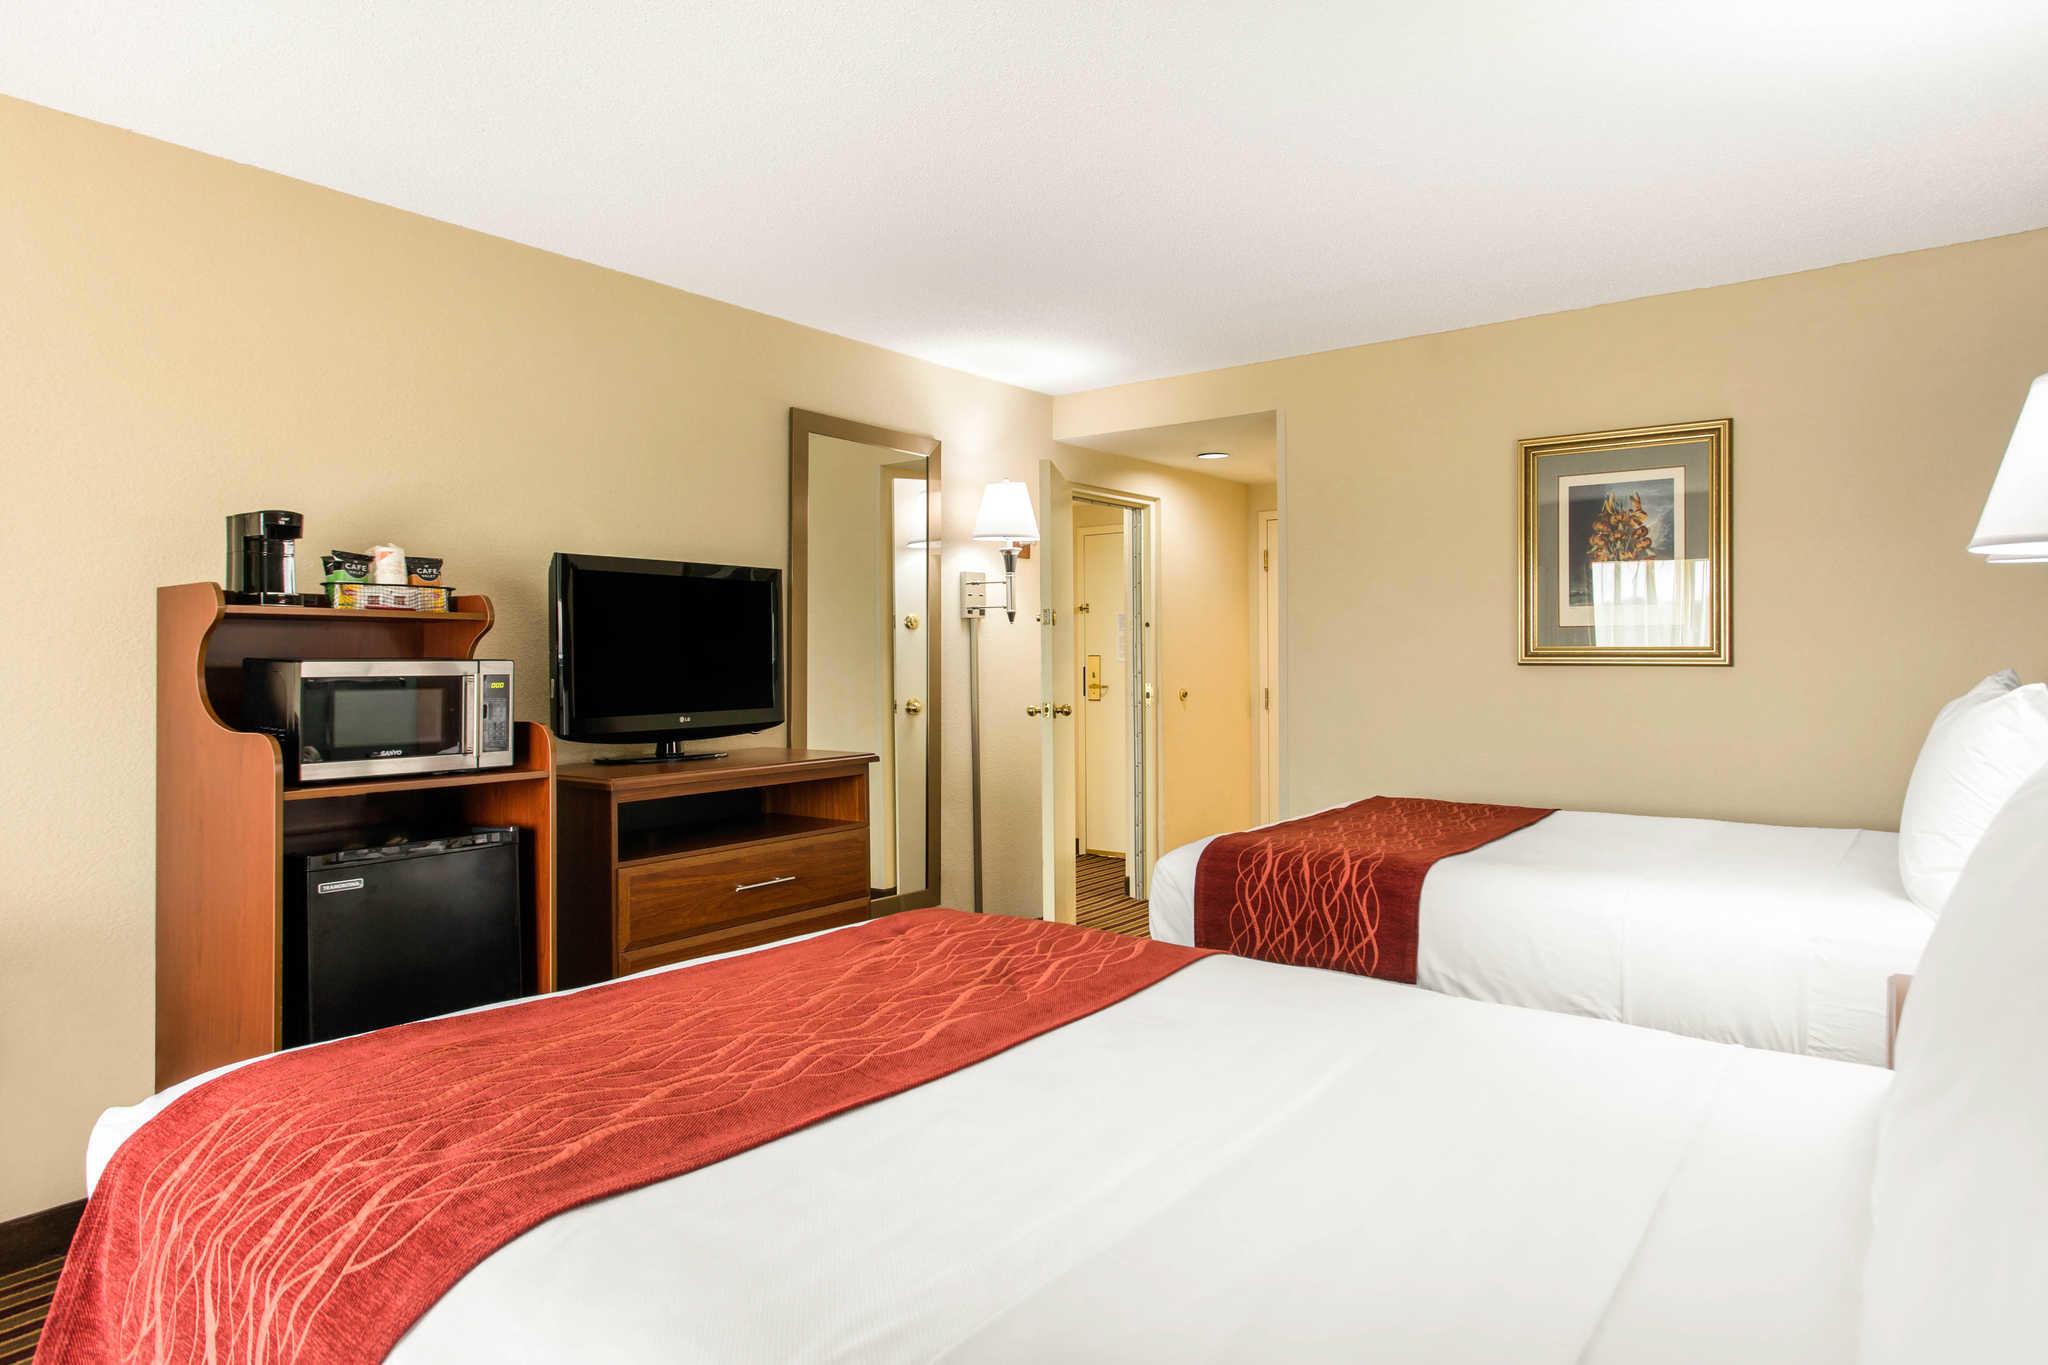 Comfort Inn & Suites Crabtree Valley image 25